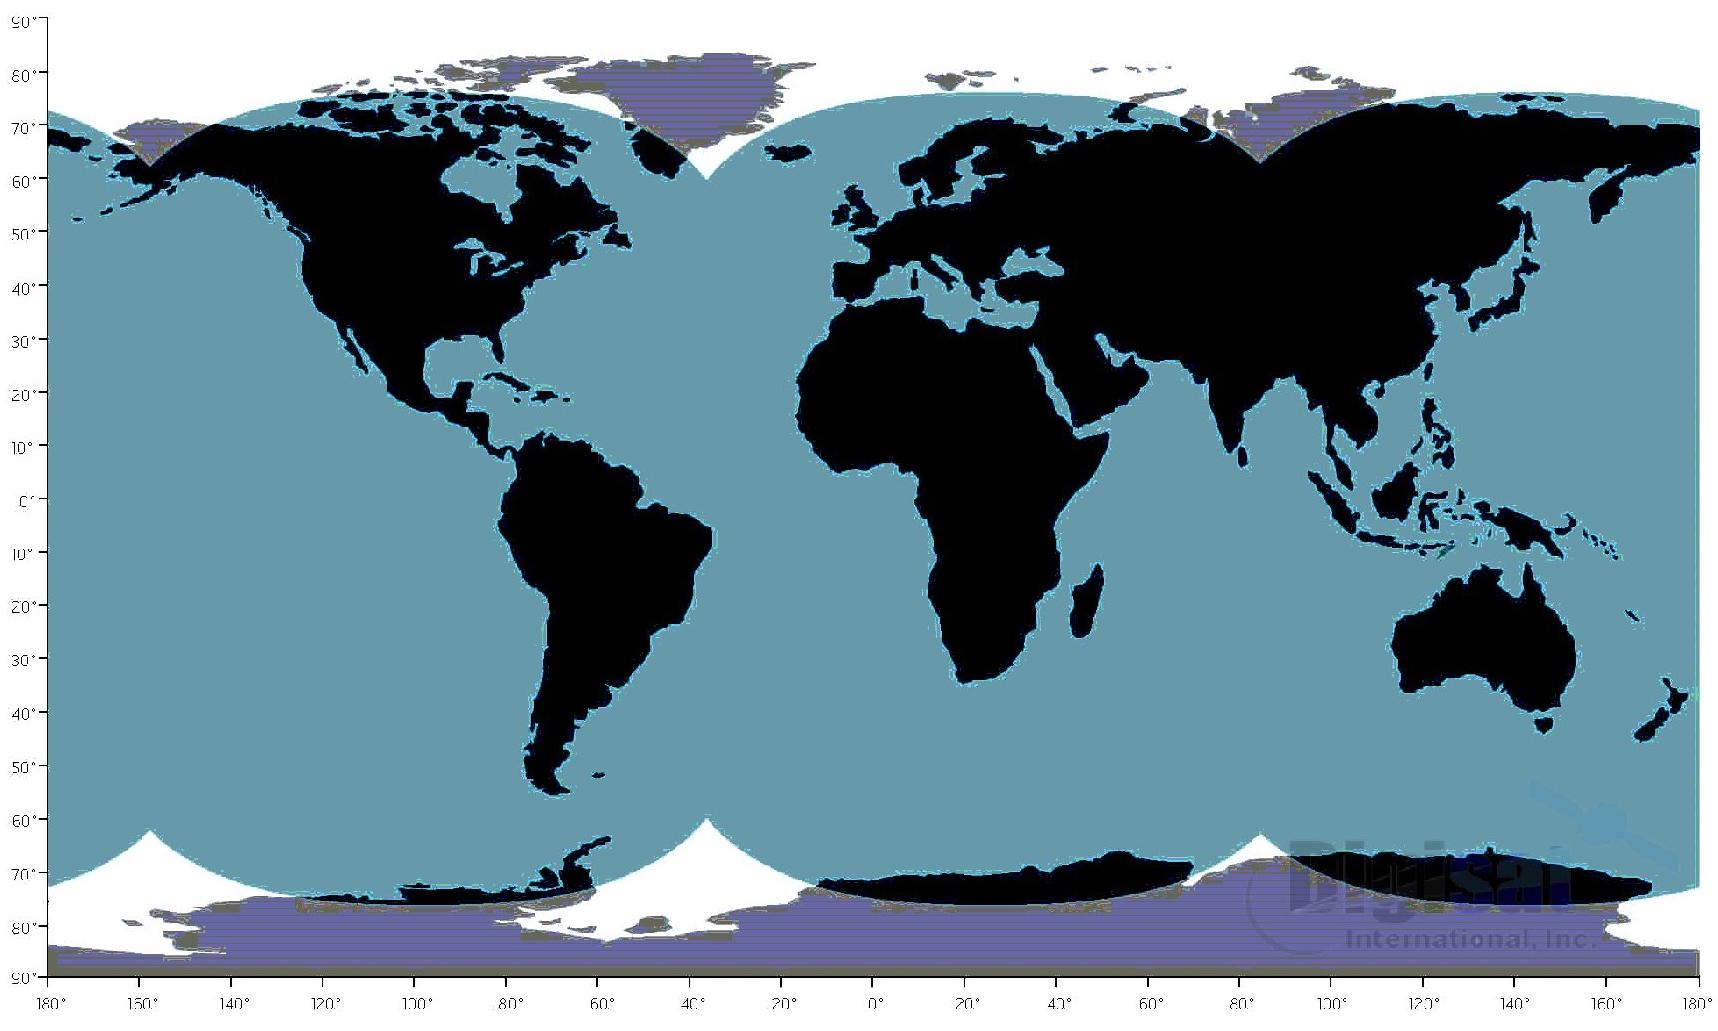 Inmarsat Coverage Map on iridium coverage map, time warner coverage map, ghana coverage map, at&t national coverage map, clearwire coverage map, t-mobile coverage map, gogo inflight coverage map, at&t 3g coverage map, at&t u-verse coverage map, at&t lte coverage map, echostar coverage map, italy coverage map, truphone coverage map, at&t network coverage map, centurylink coverage map, thuraya coverage map, family mobile coverage map, boat us coverage map, satellite internet coverage map,